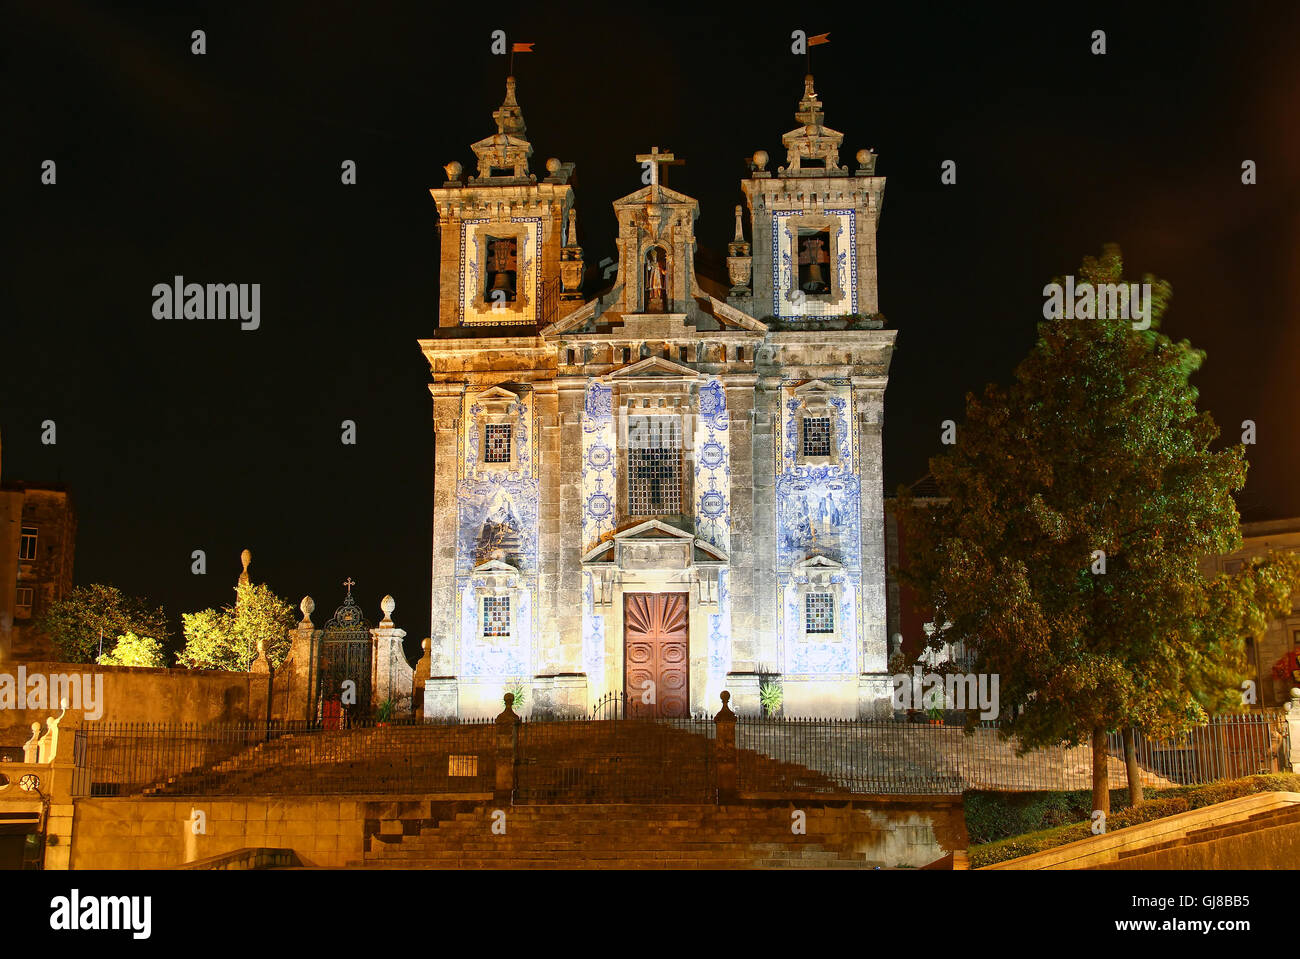 Old church of Saint Ildefonso (Igreja de Santo Ildefonso) covered with azulejos tiles, Porto, Portugal - Stock Image